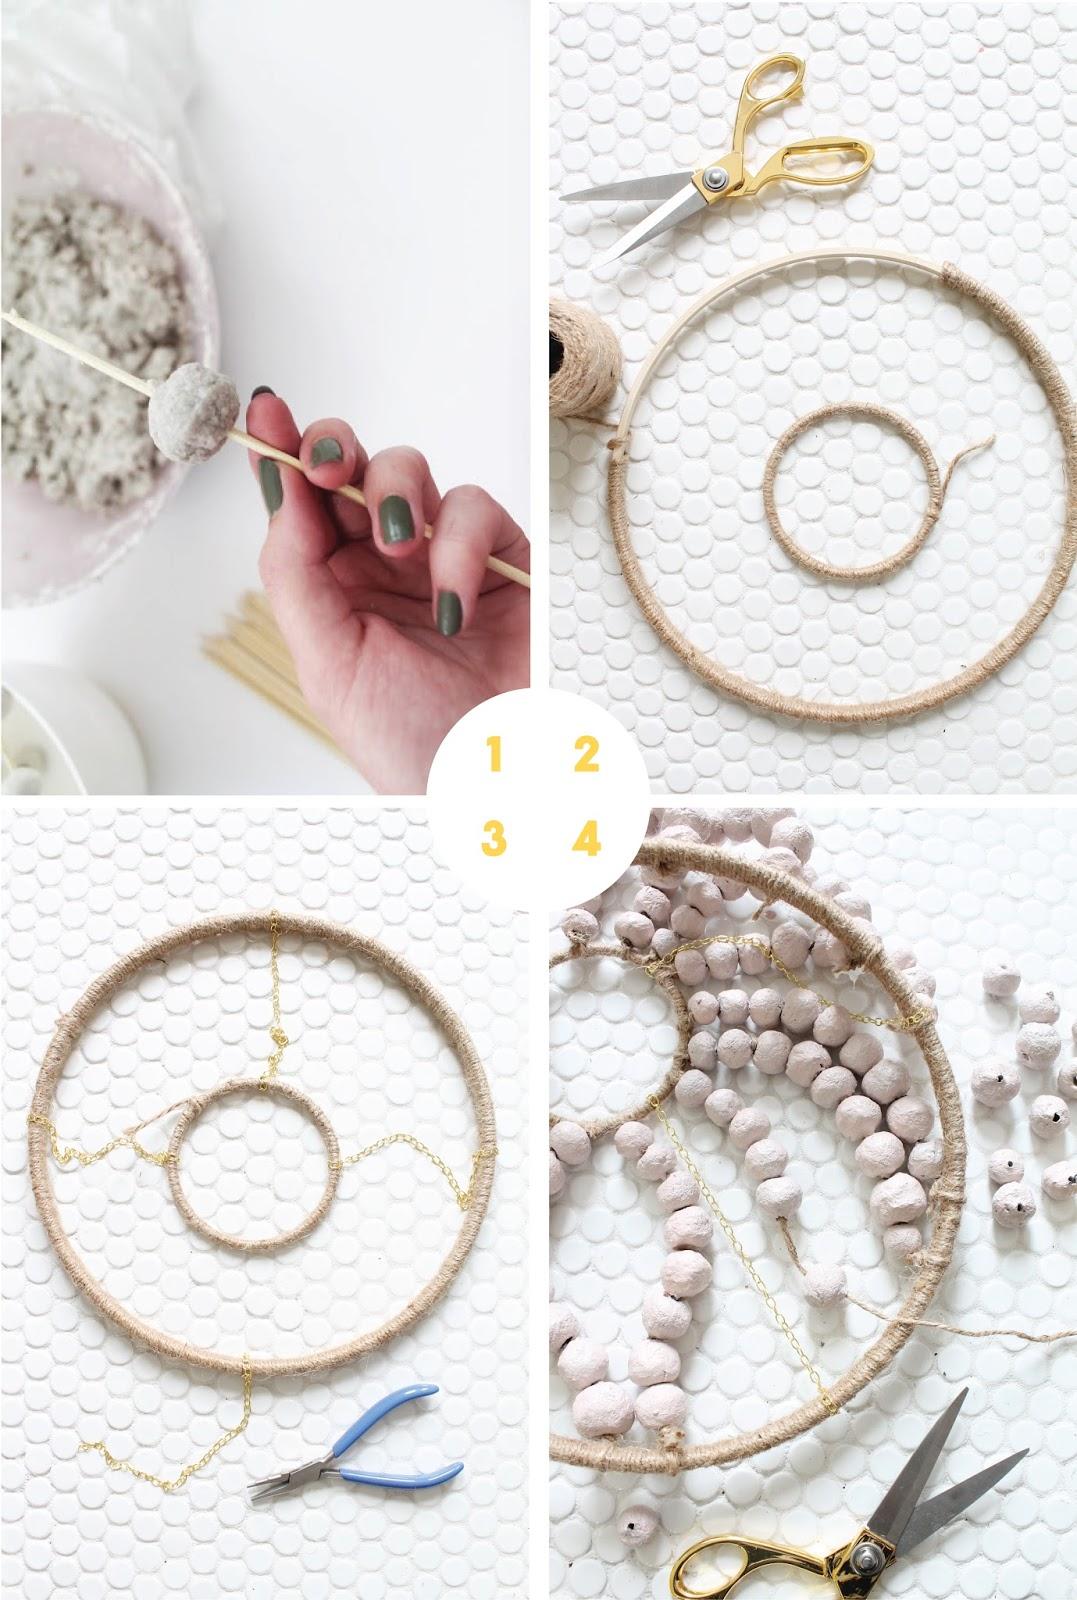 Make a papier mache beaded chandelier